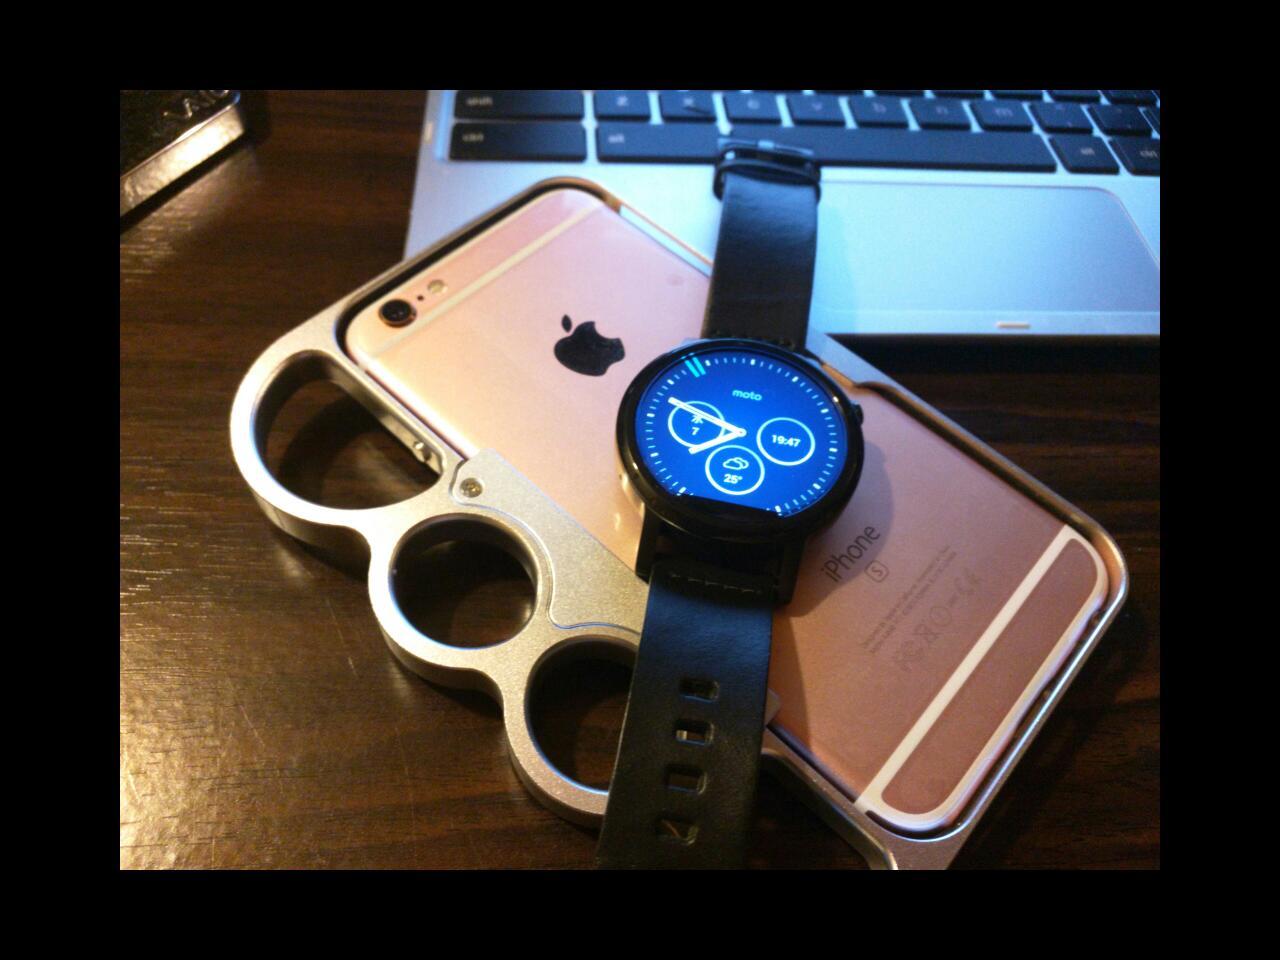 """Jetstream CHANNEL"" 2015年10月7日『.J』Episode 26: 「Moto 360 2nd Gen」が届いて「iPhone 6s」を契約しました"